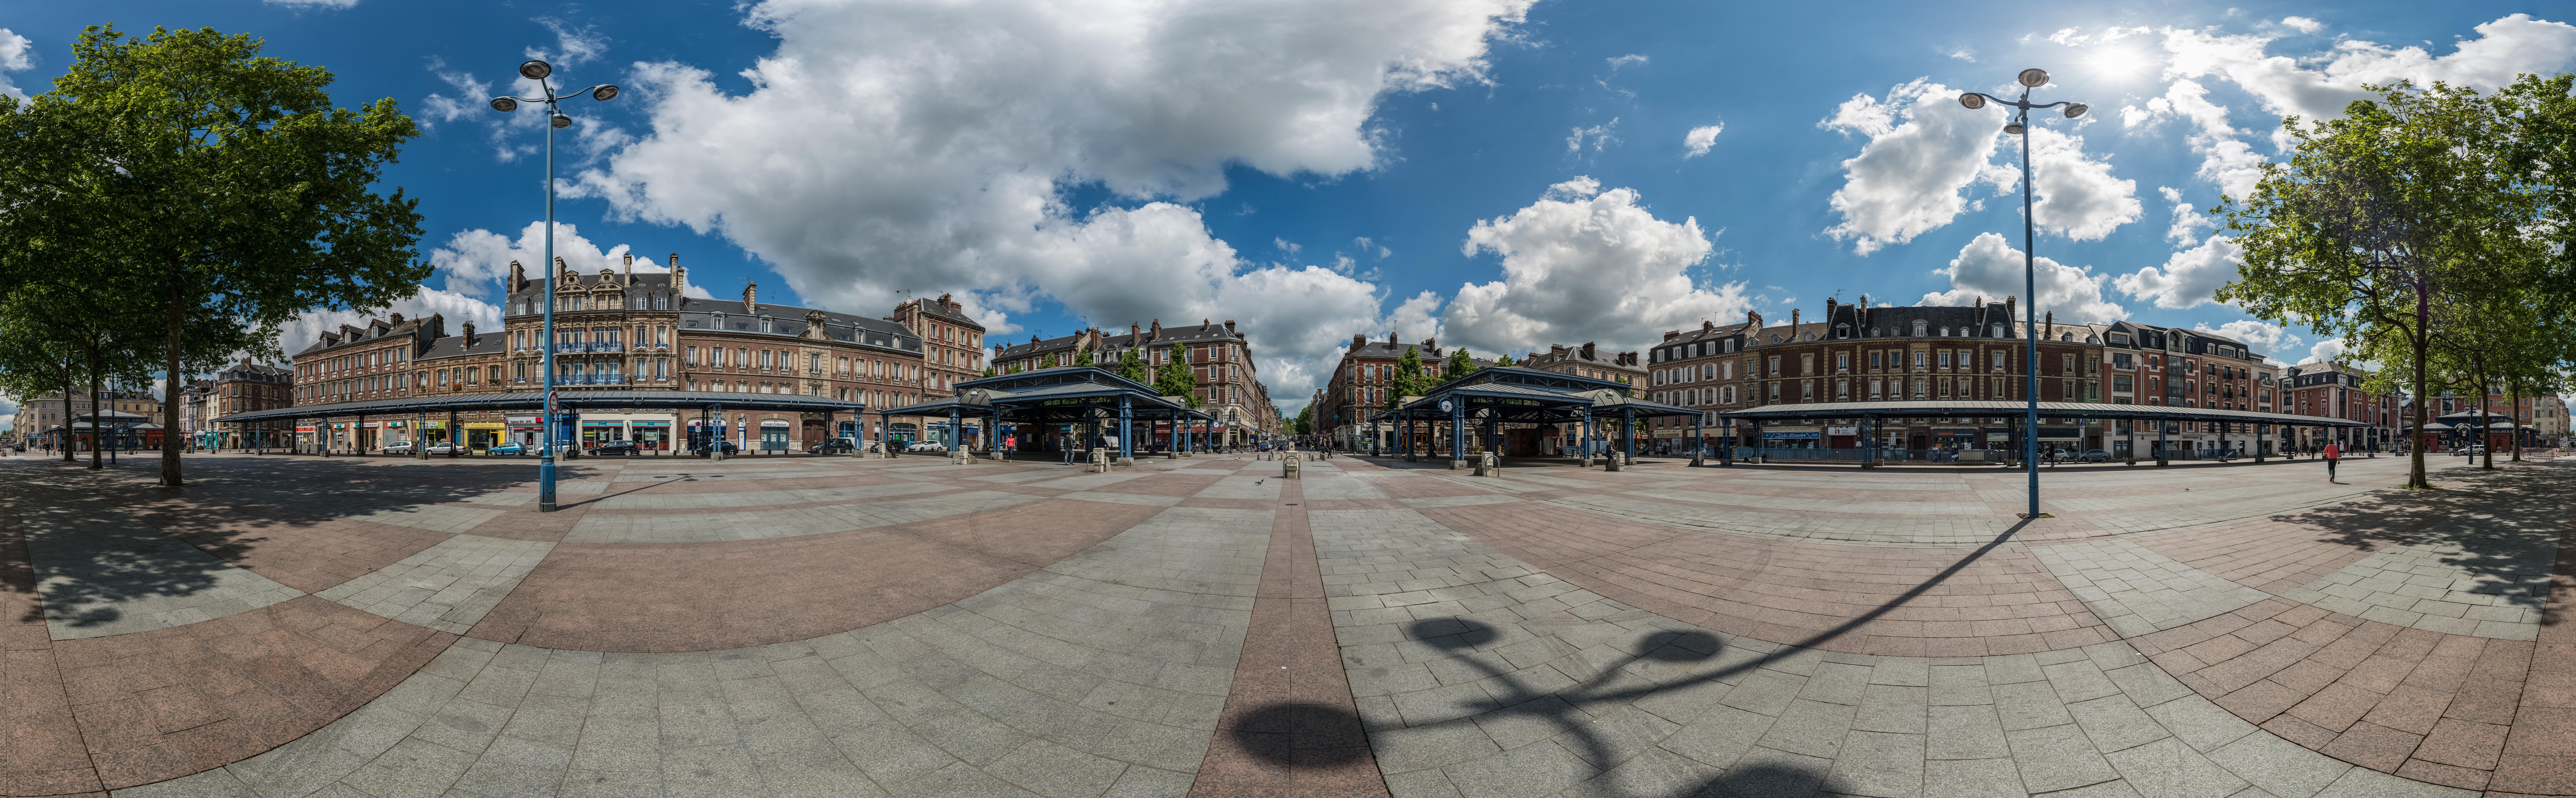 File Place Saint Marc Rouen 20140514 1 Jpg Wikimedia Commons